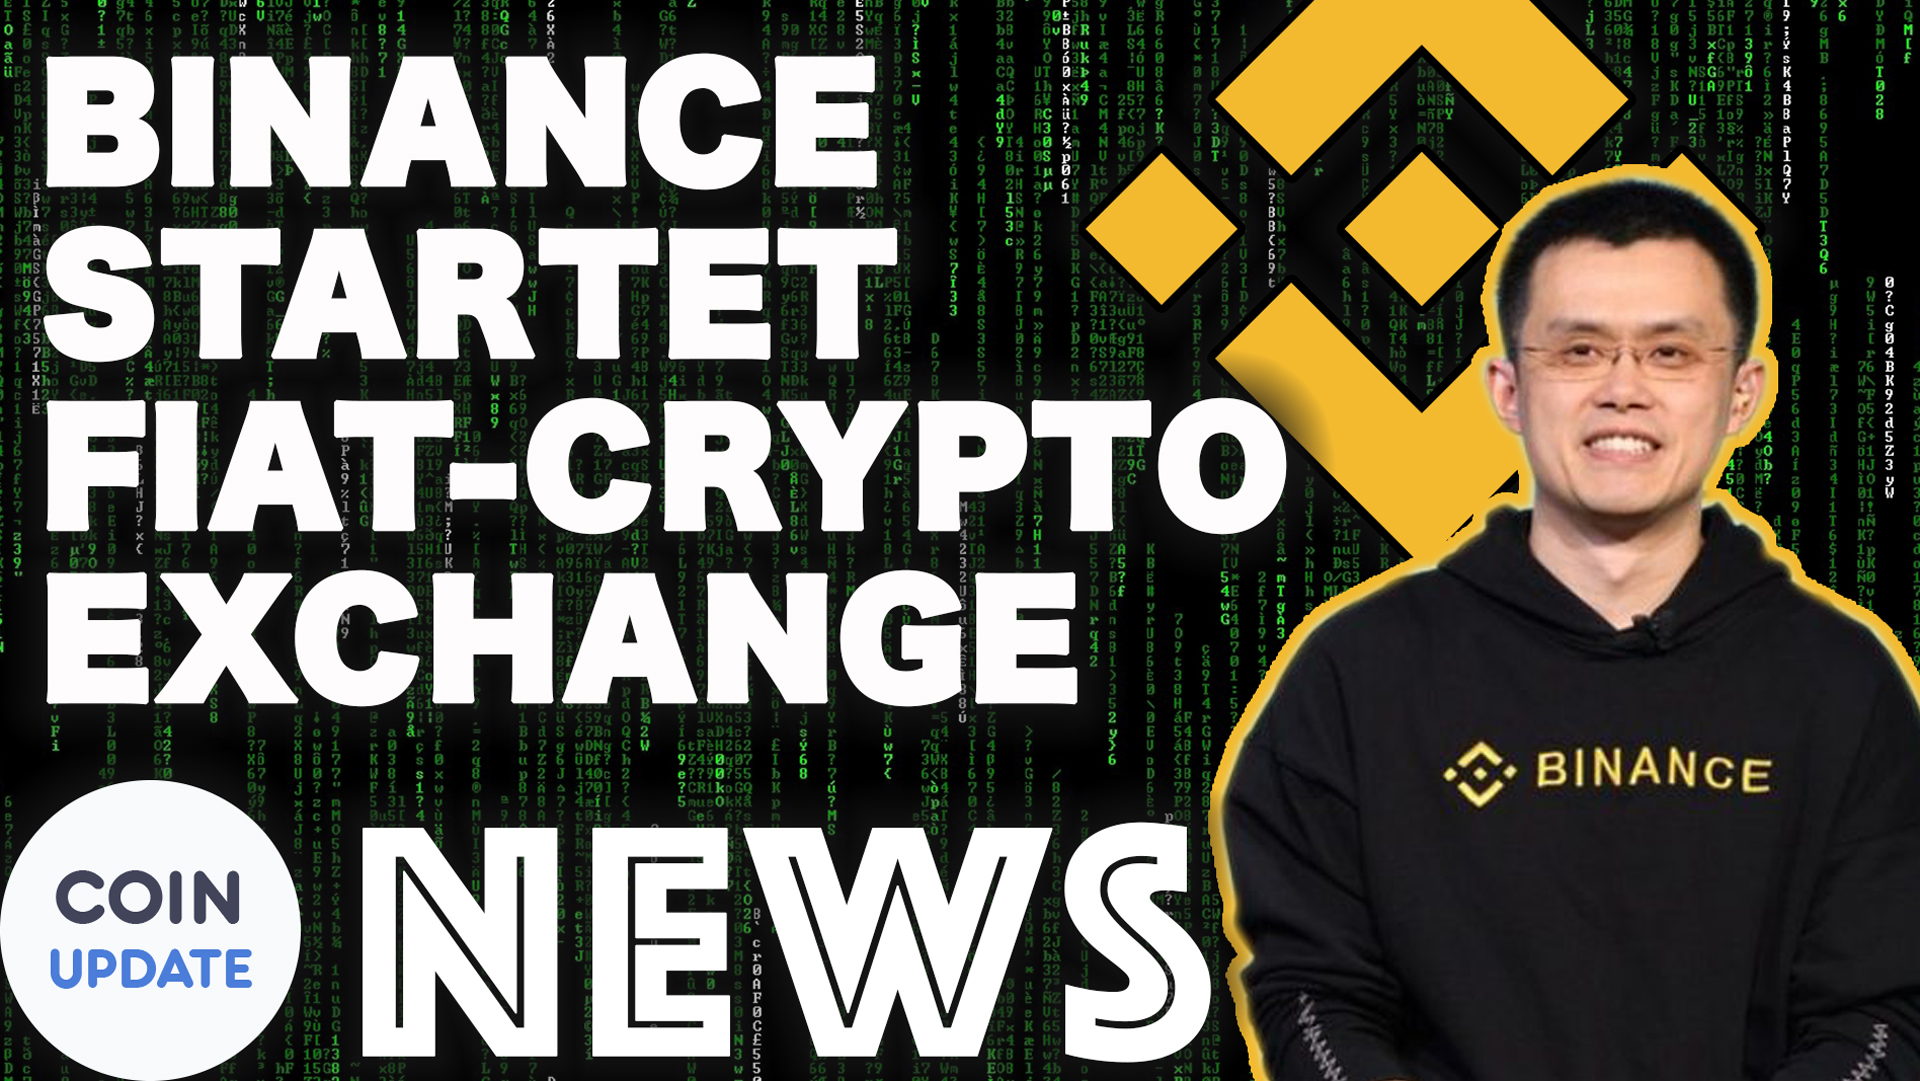 Binance Fiat-to-Crypto Exchange,